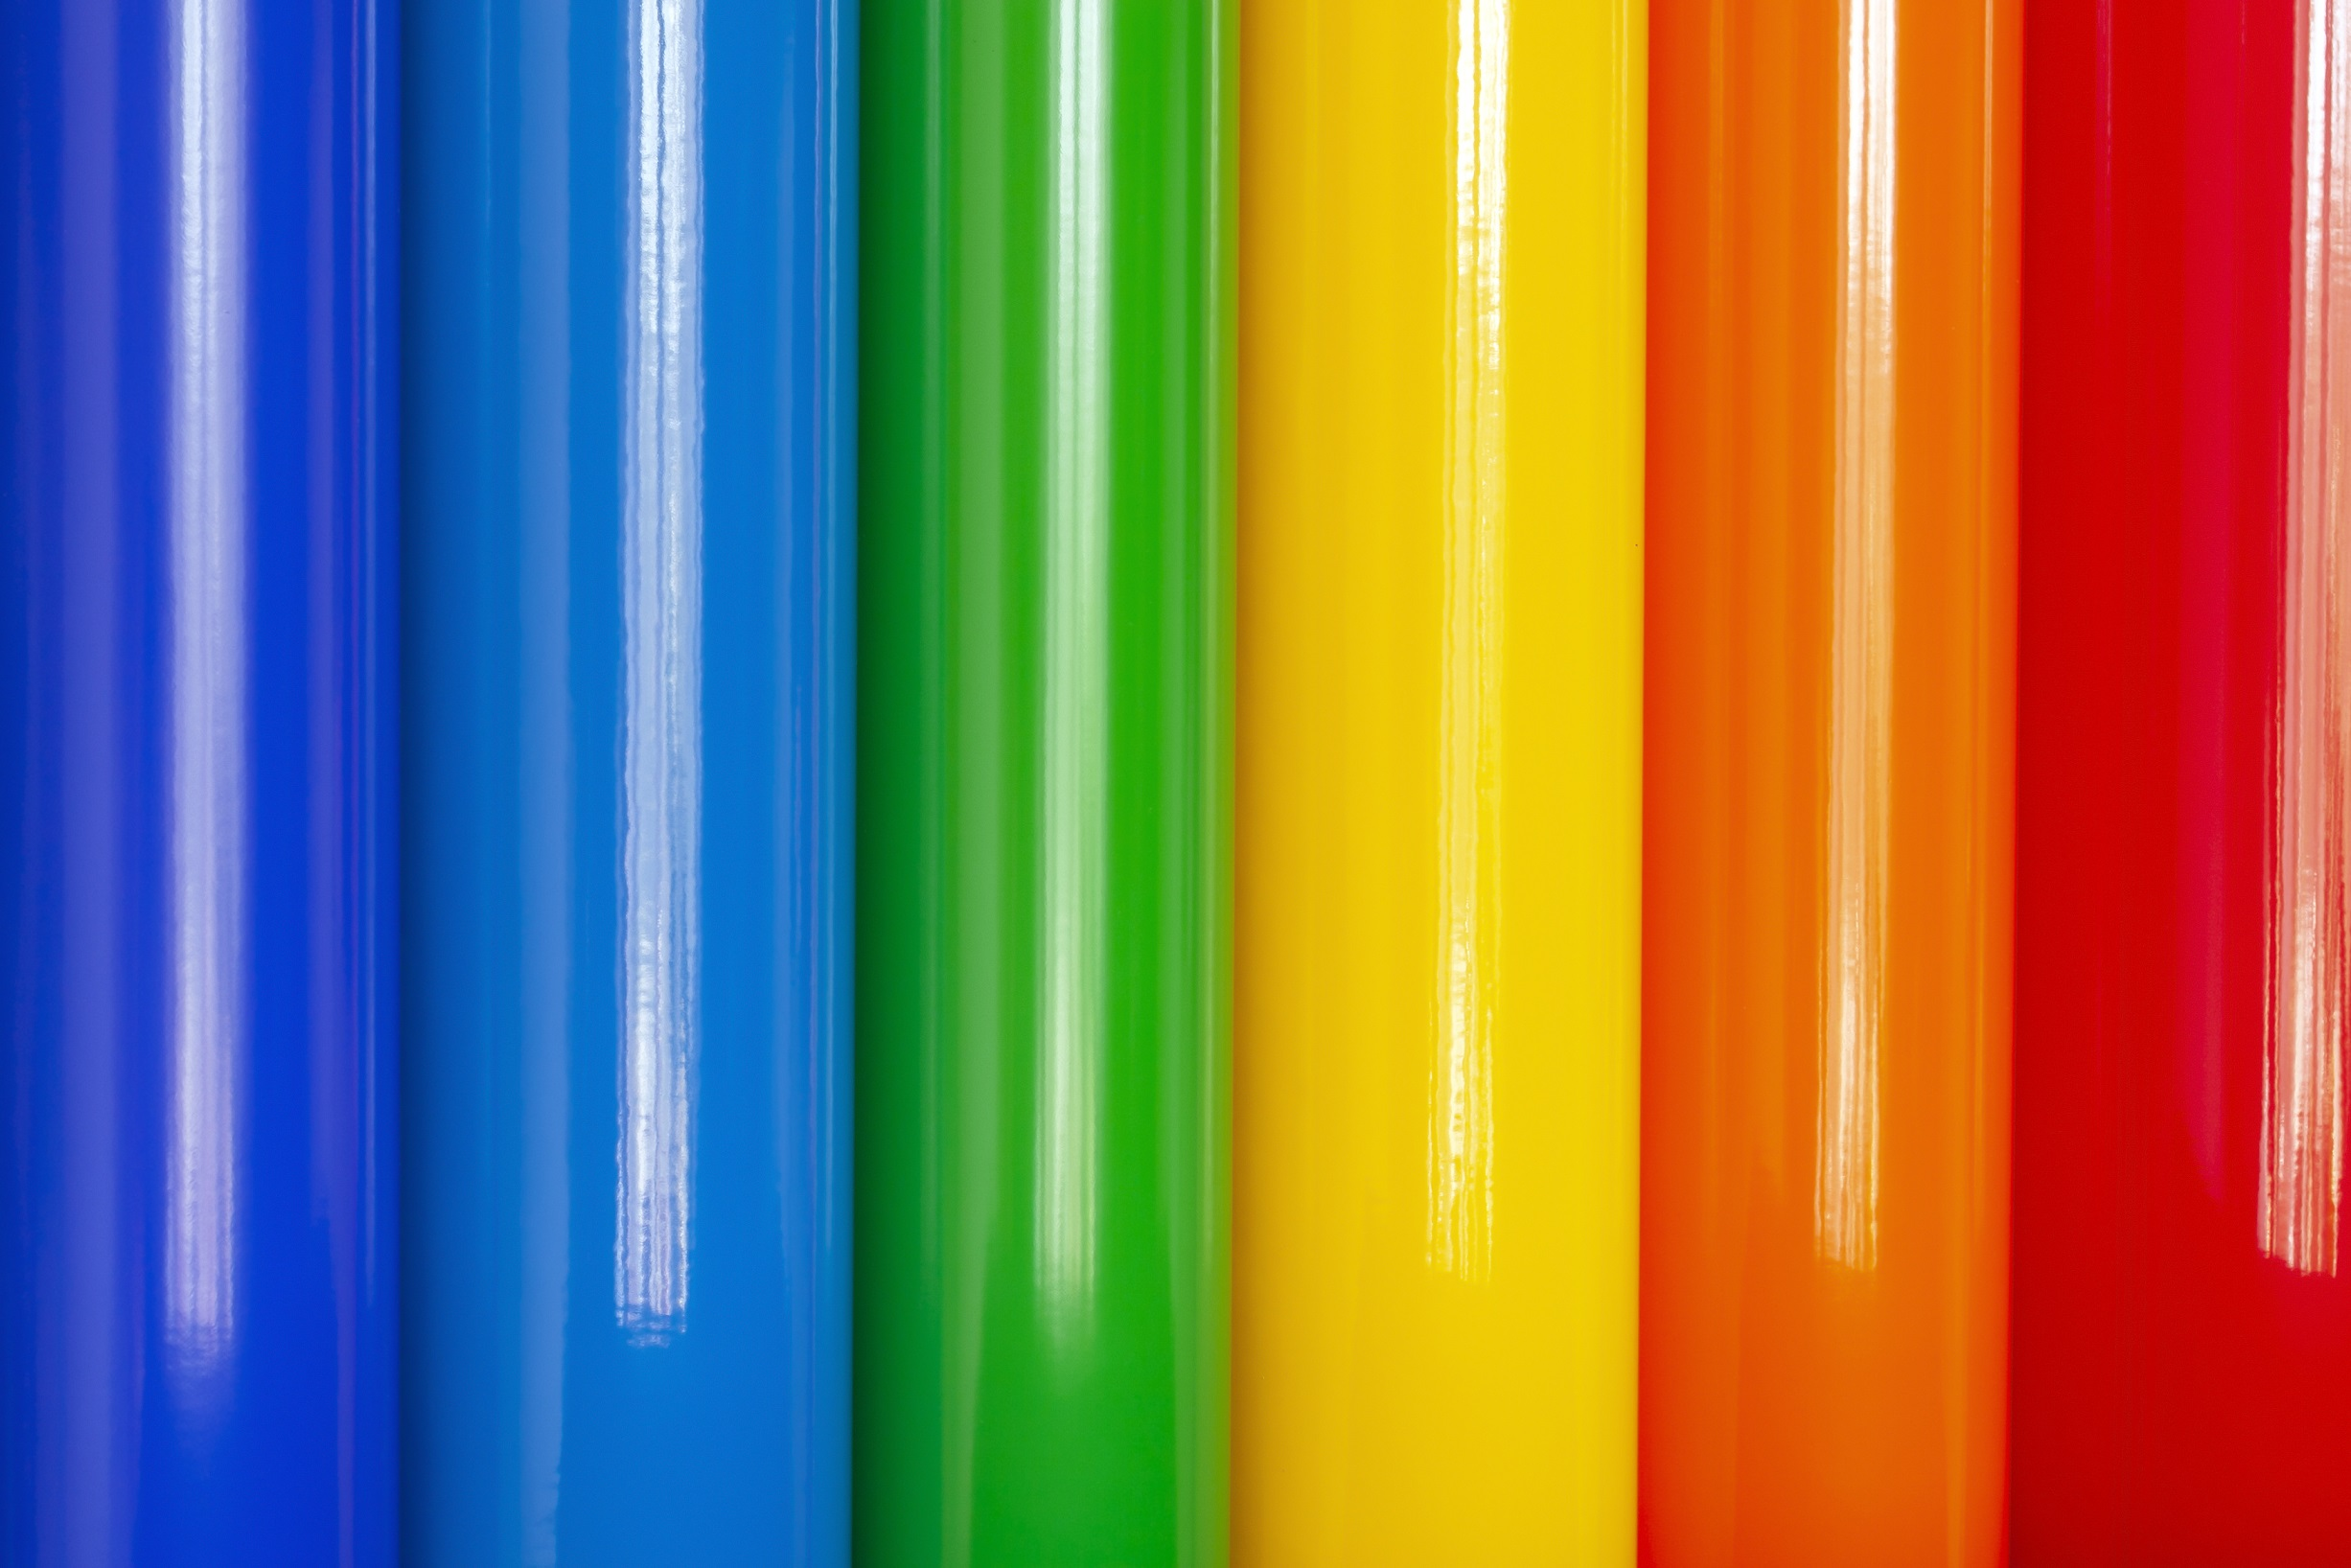 folie colorata